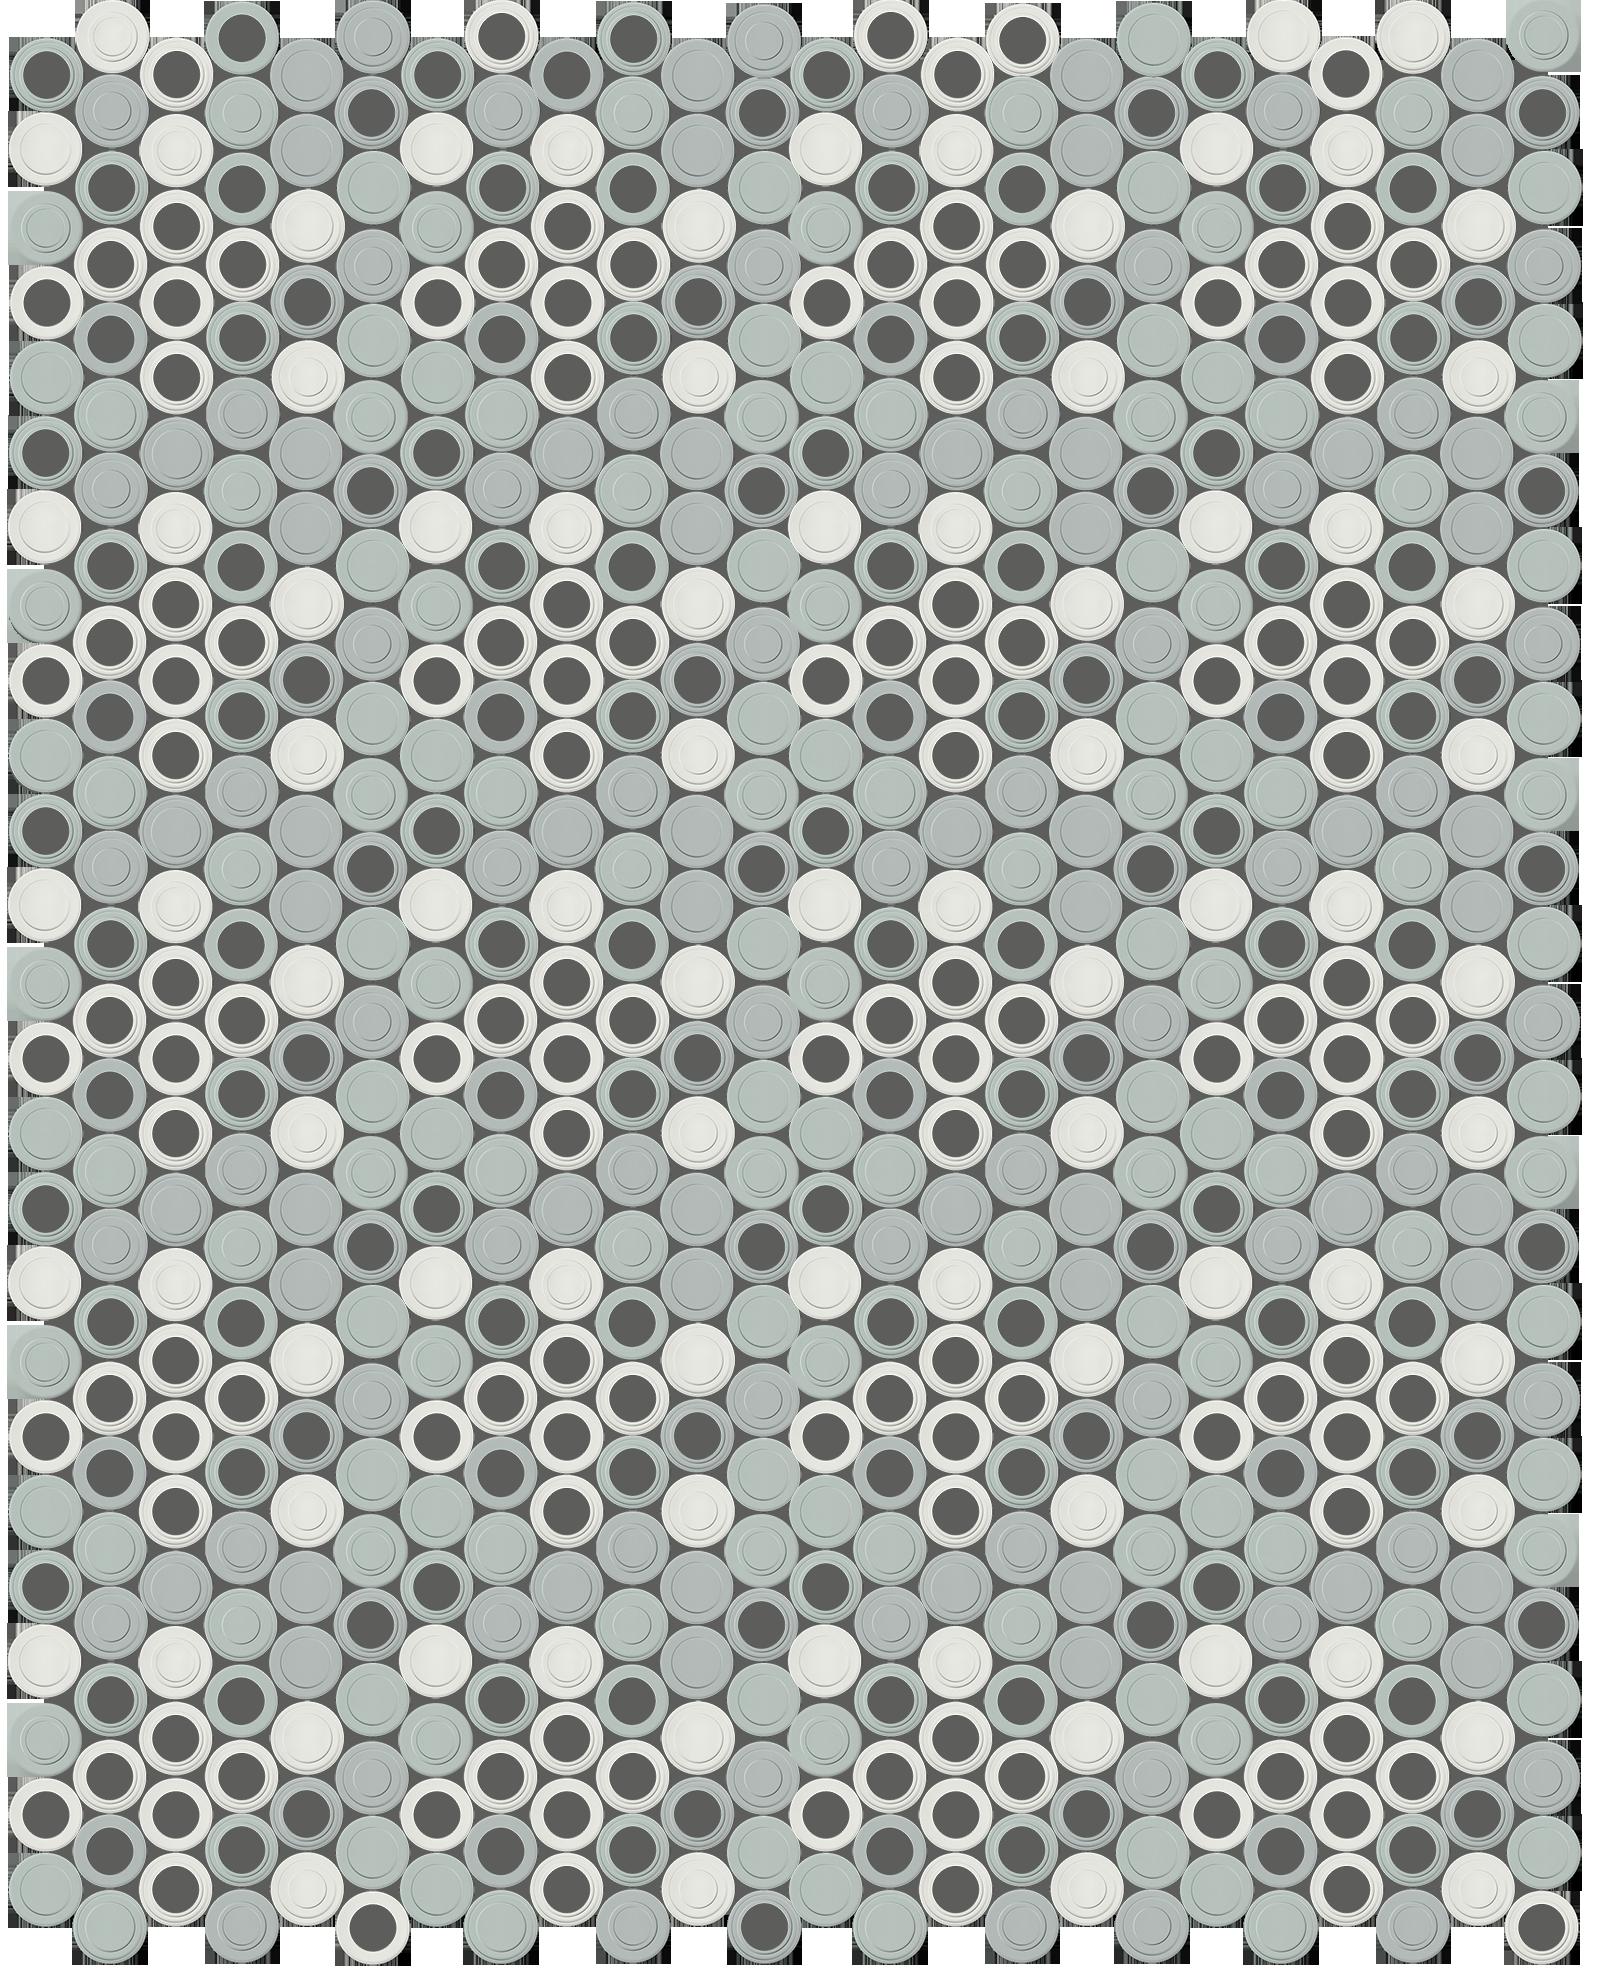 R1-R6 : Pattern D